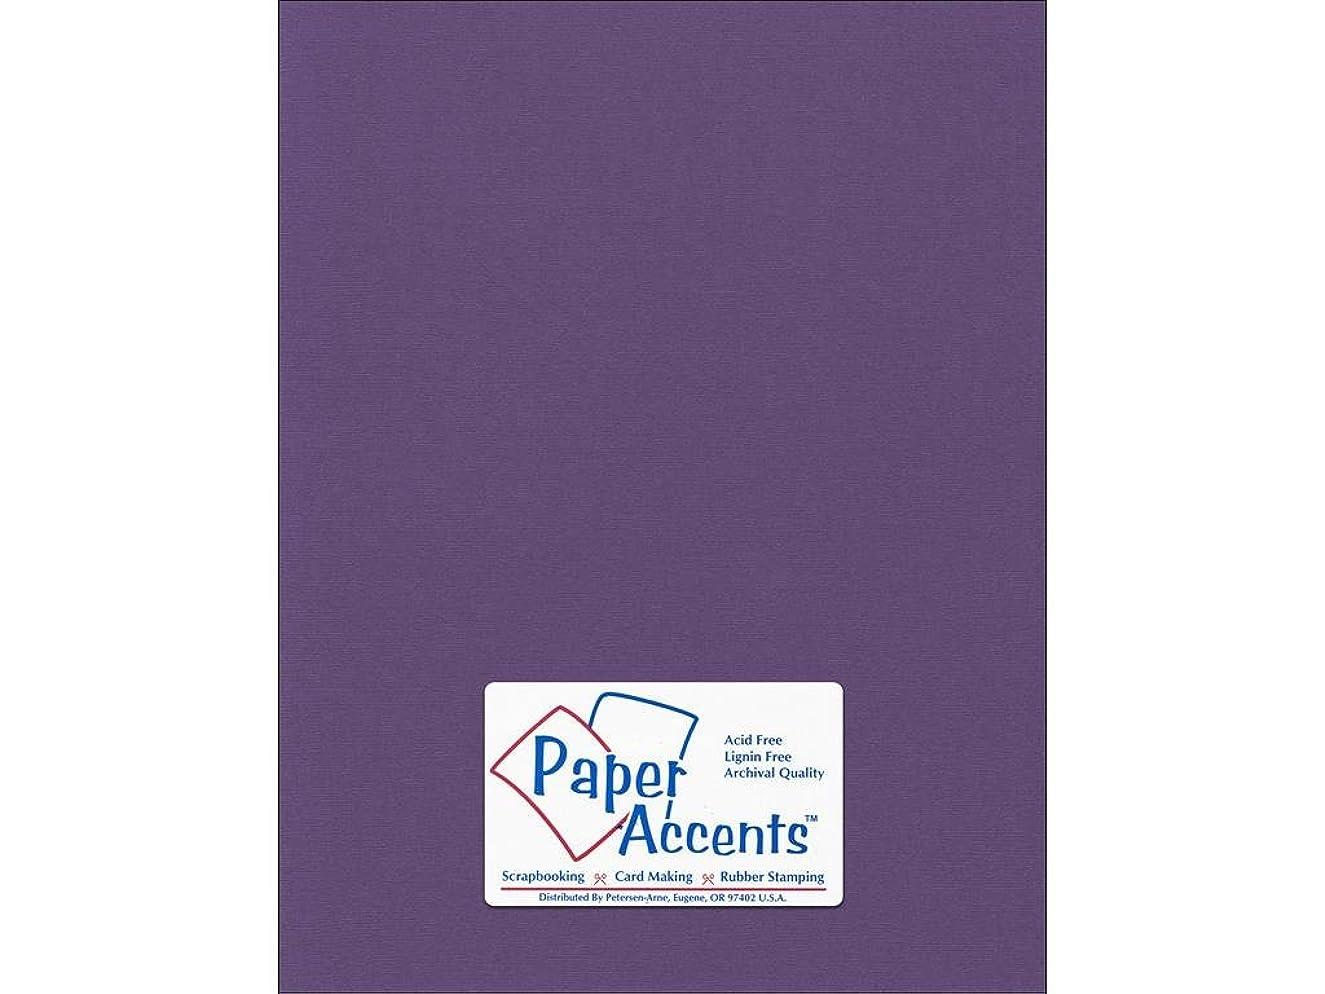 Accent Design Paper Accents Cdstk Canvas 8.5x11 80# Grape Vine